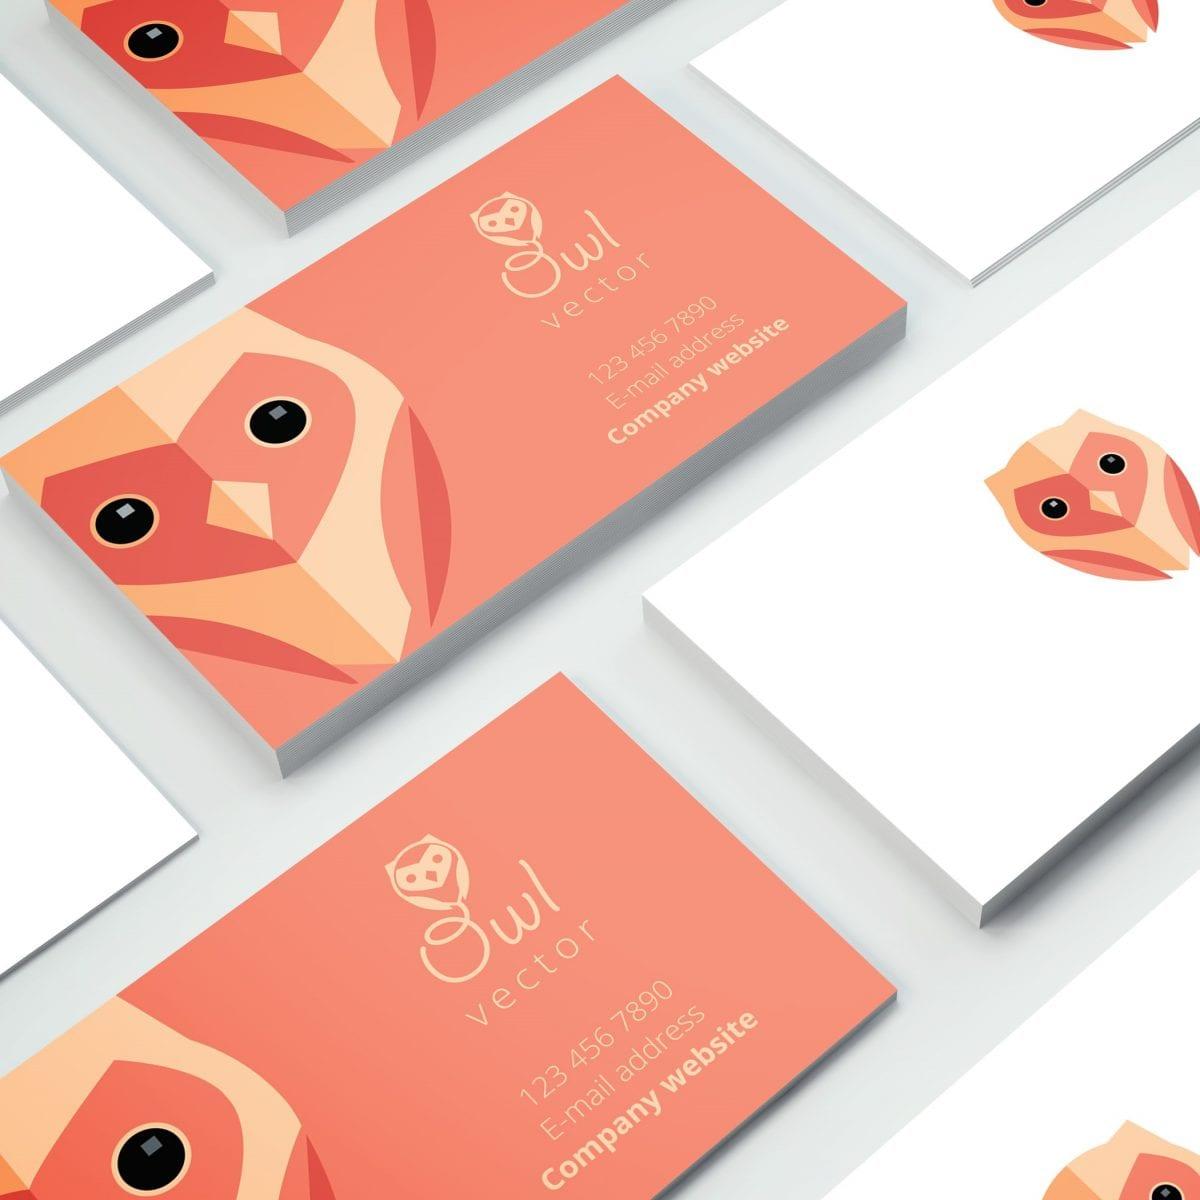 Business-Card-Mockup-Vo4l